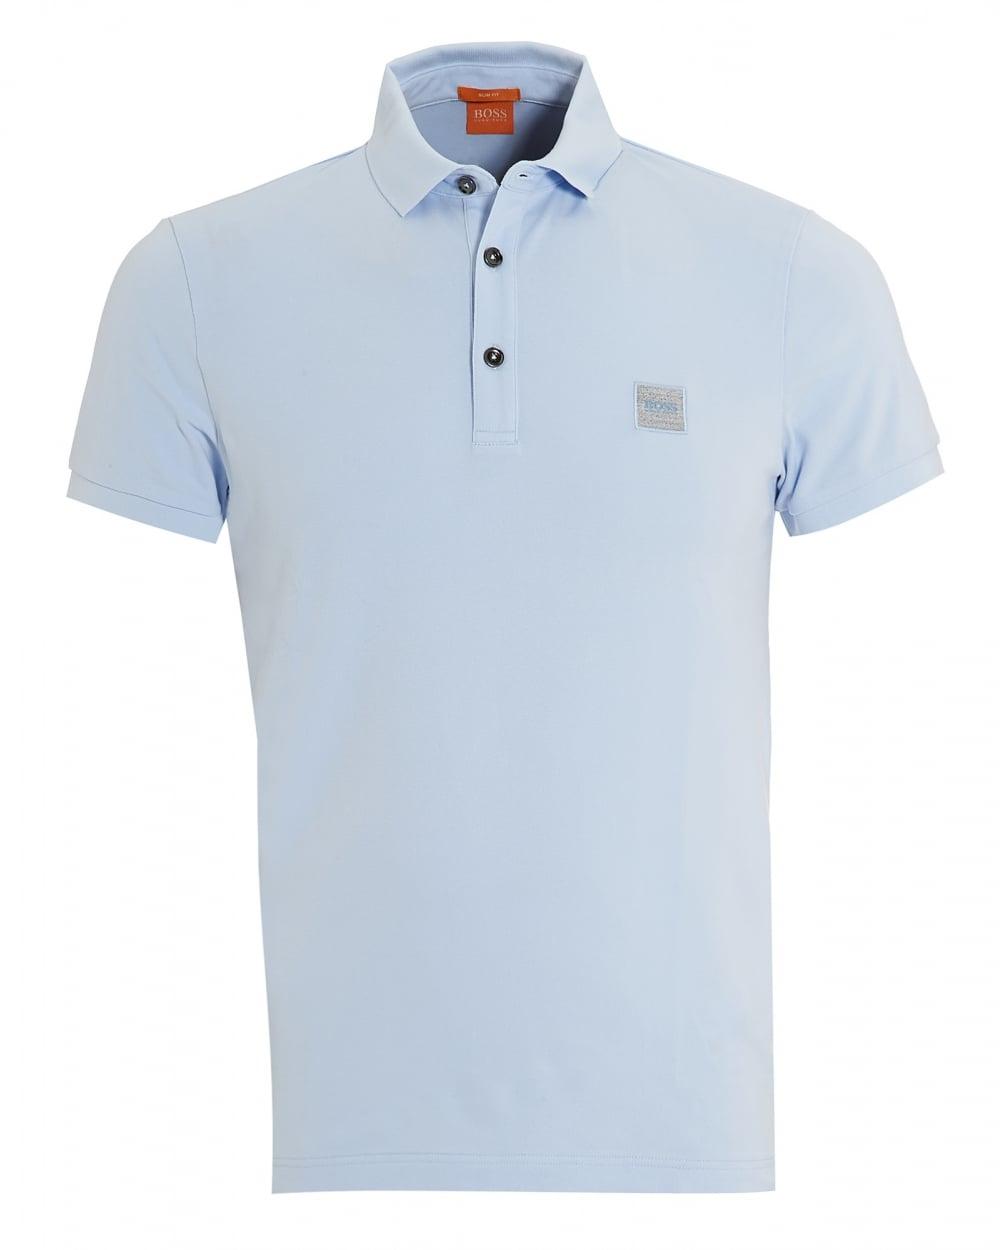 Mens Pavlik Polo, Basic Slim Fit Light Sky Blue Polo Shirt